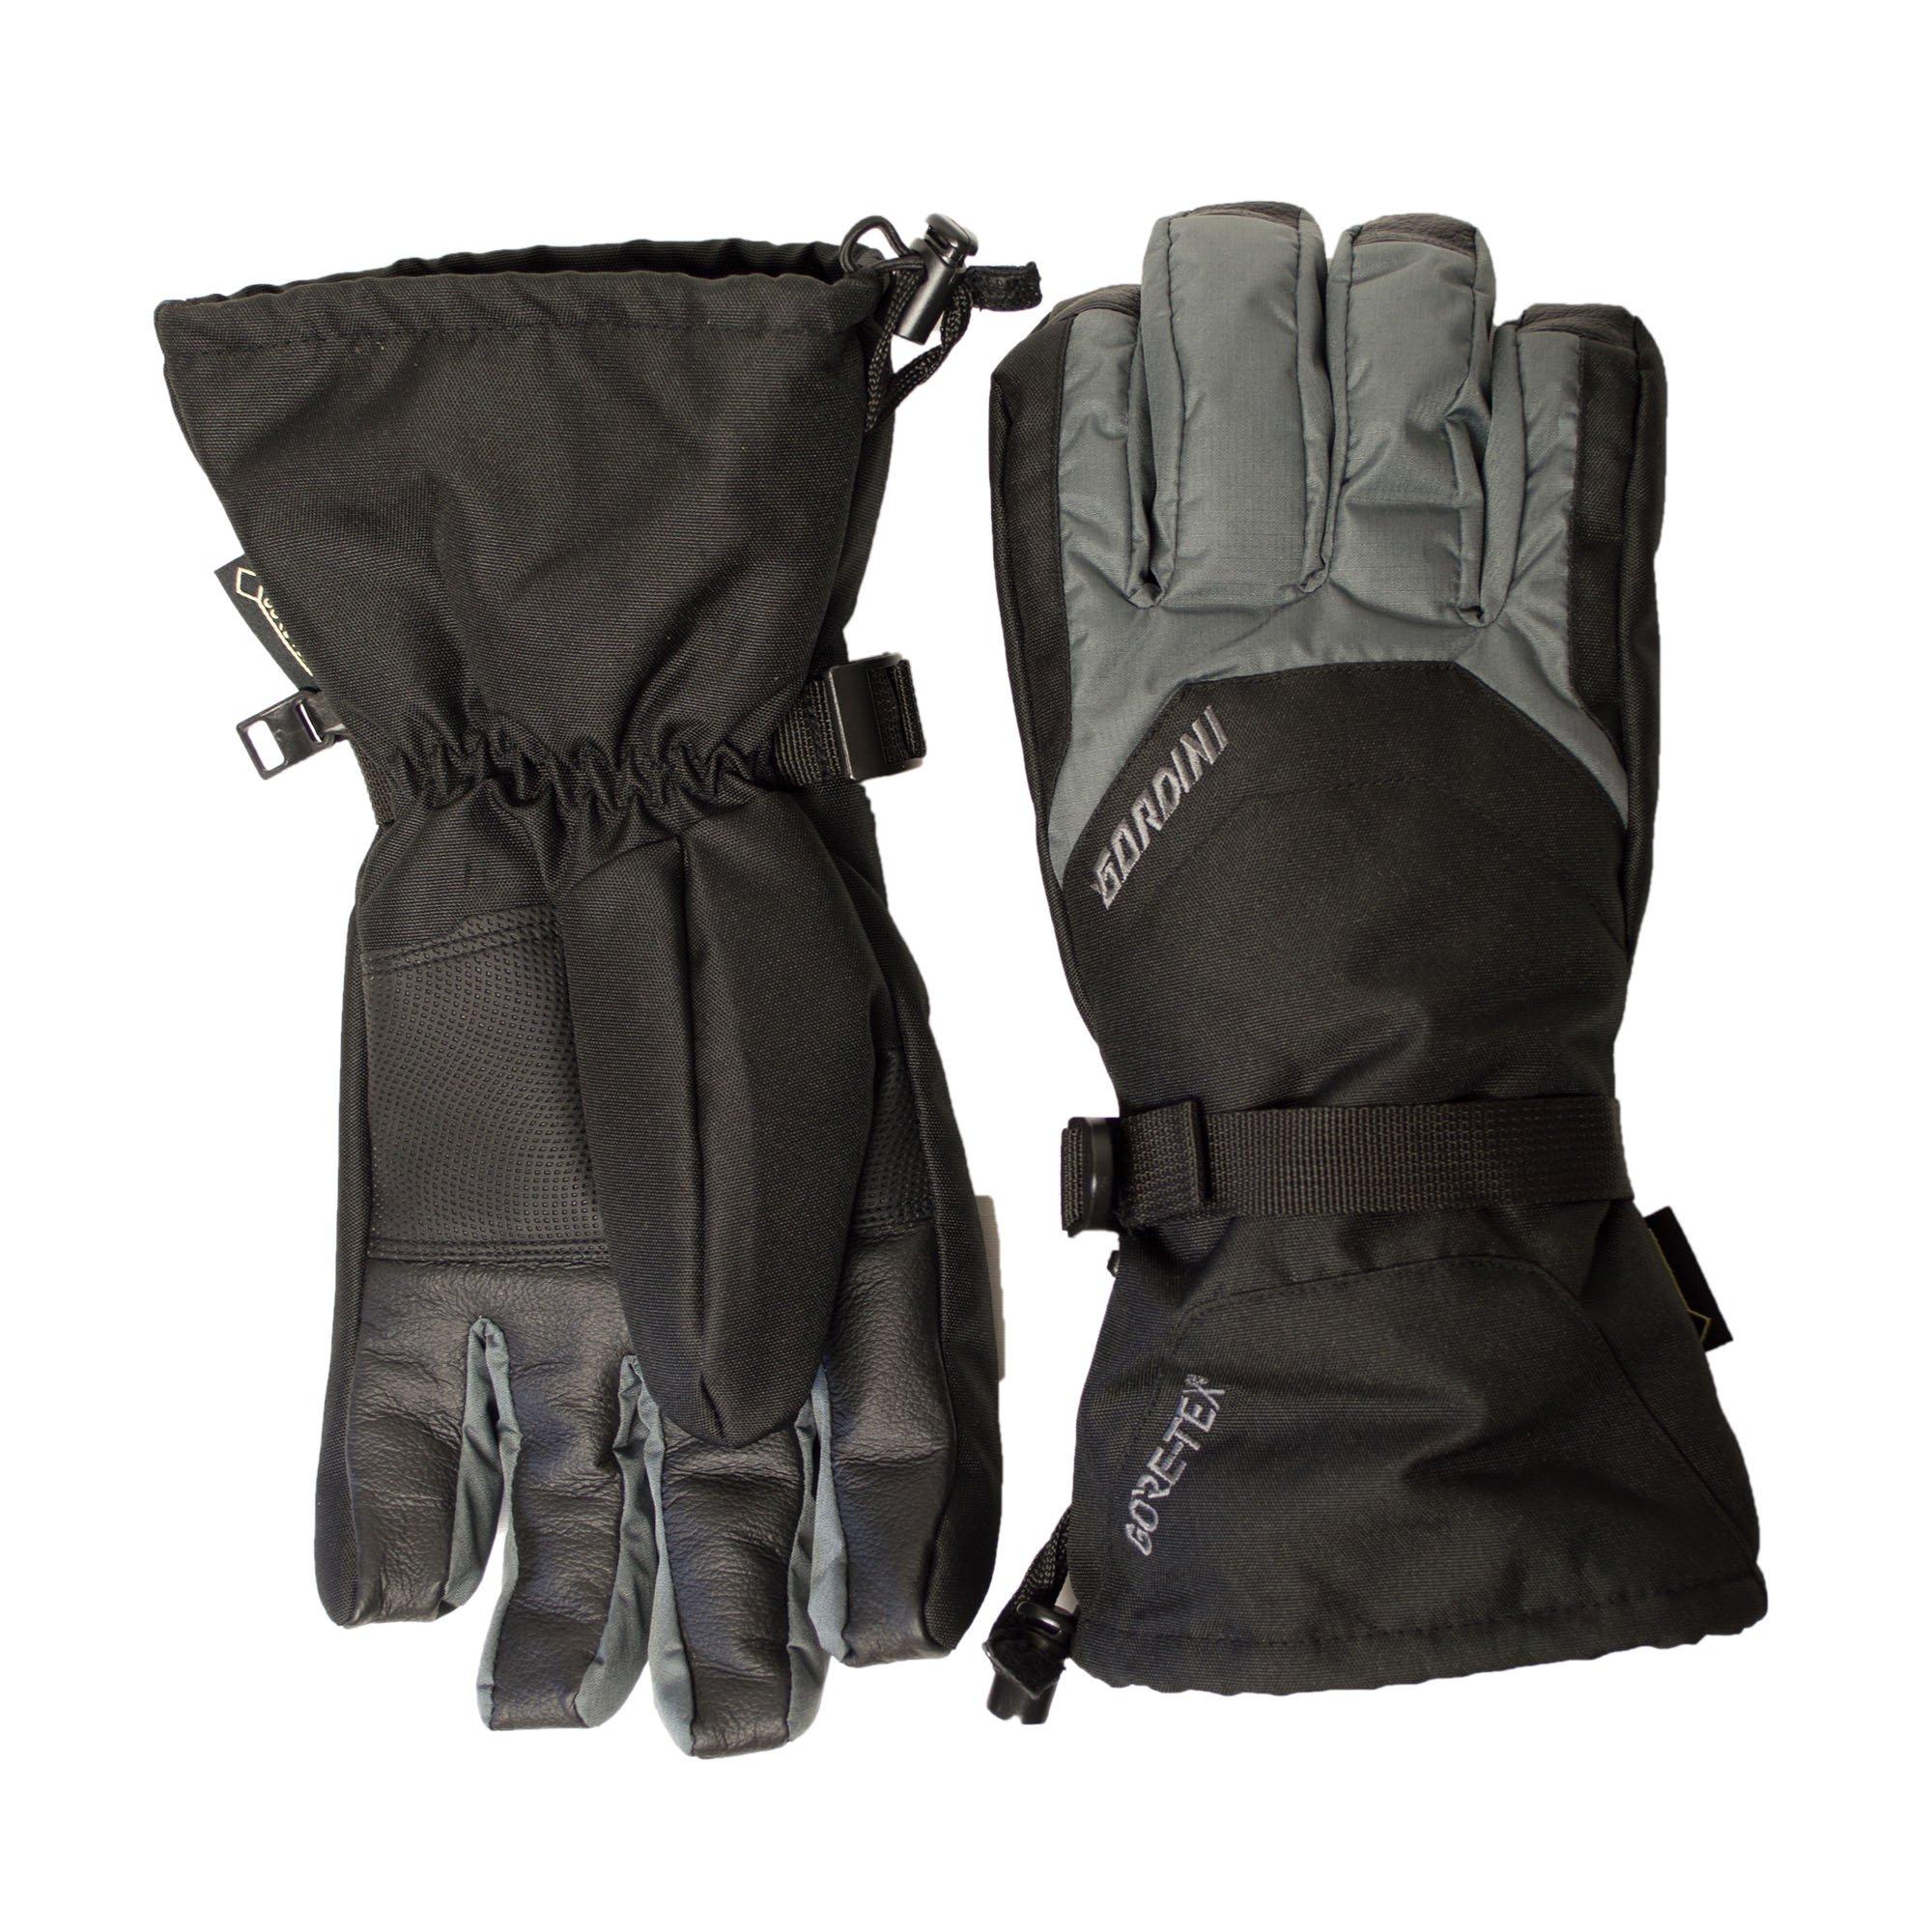 Gordini Gore-Tex Gauntlet Gloves-Black/Gunmetal-Medium by Gordini